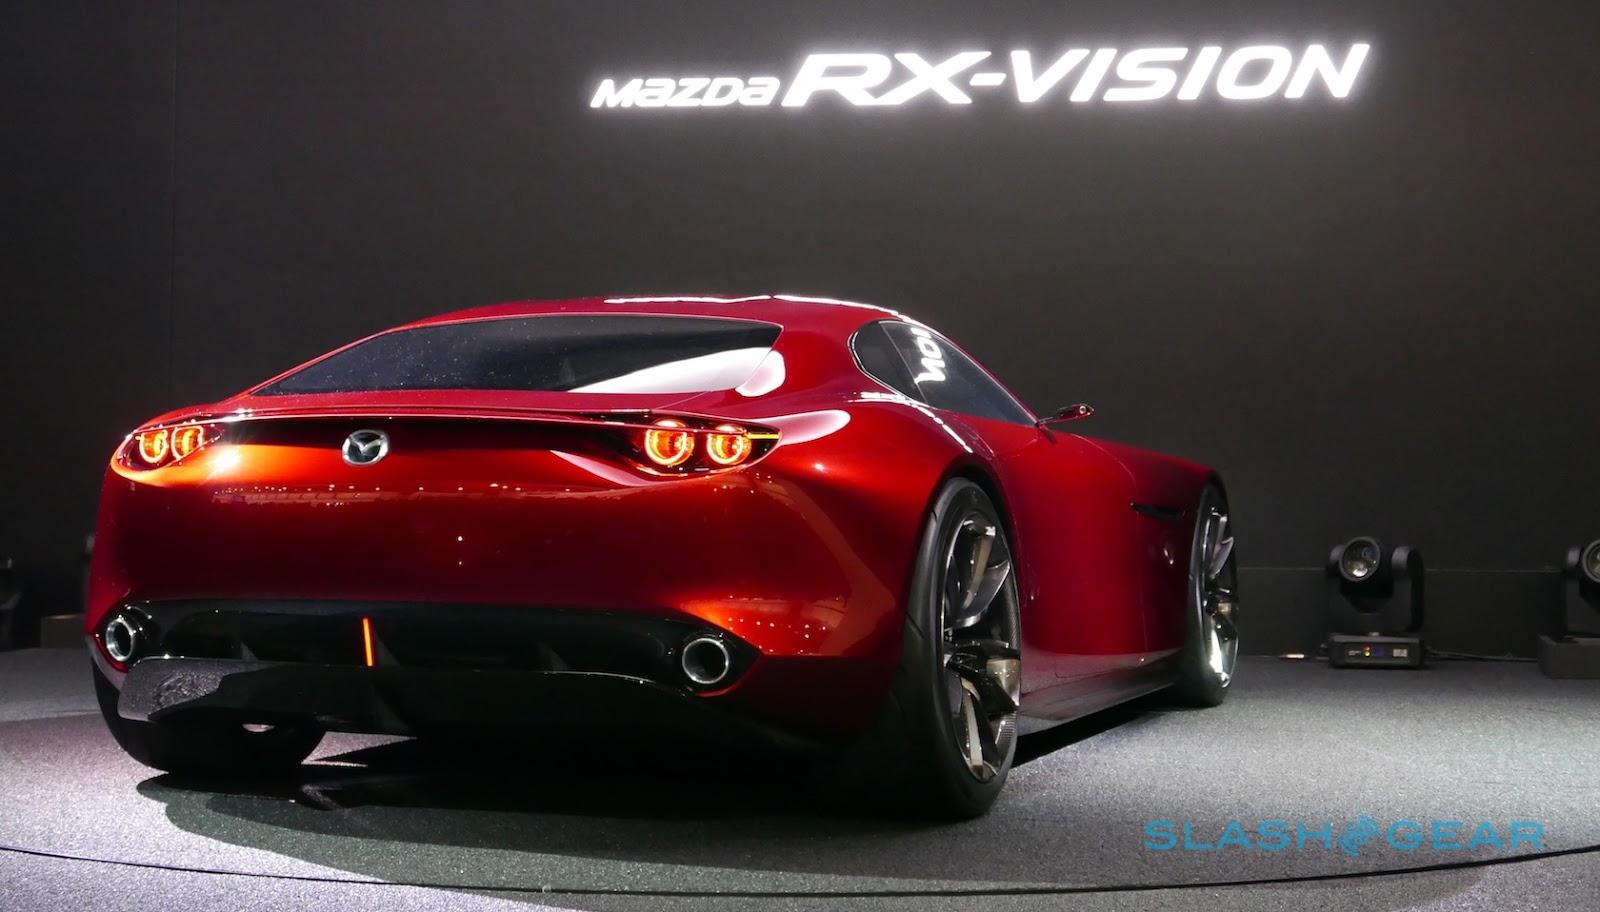 mazda rx vision concept sg 17 Ο επόμενος ρότορας θα είναι τουρμπάτος! Mazda, Mazda RX-9, Mazda RX-Vision Concept, zblog